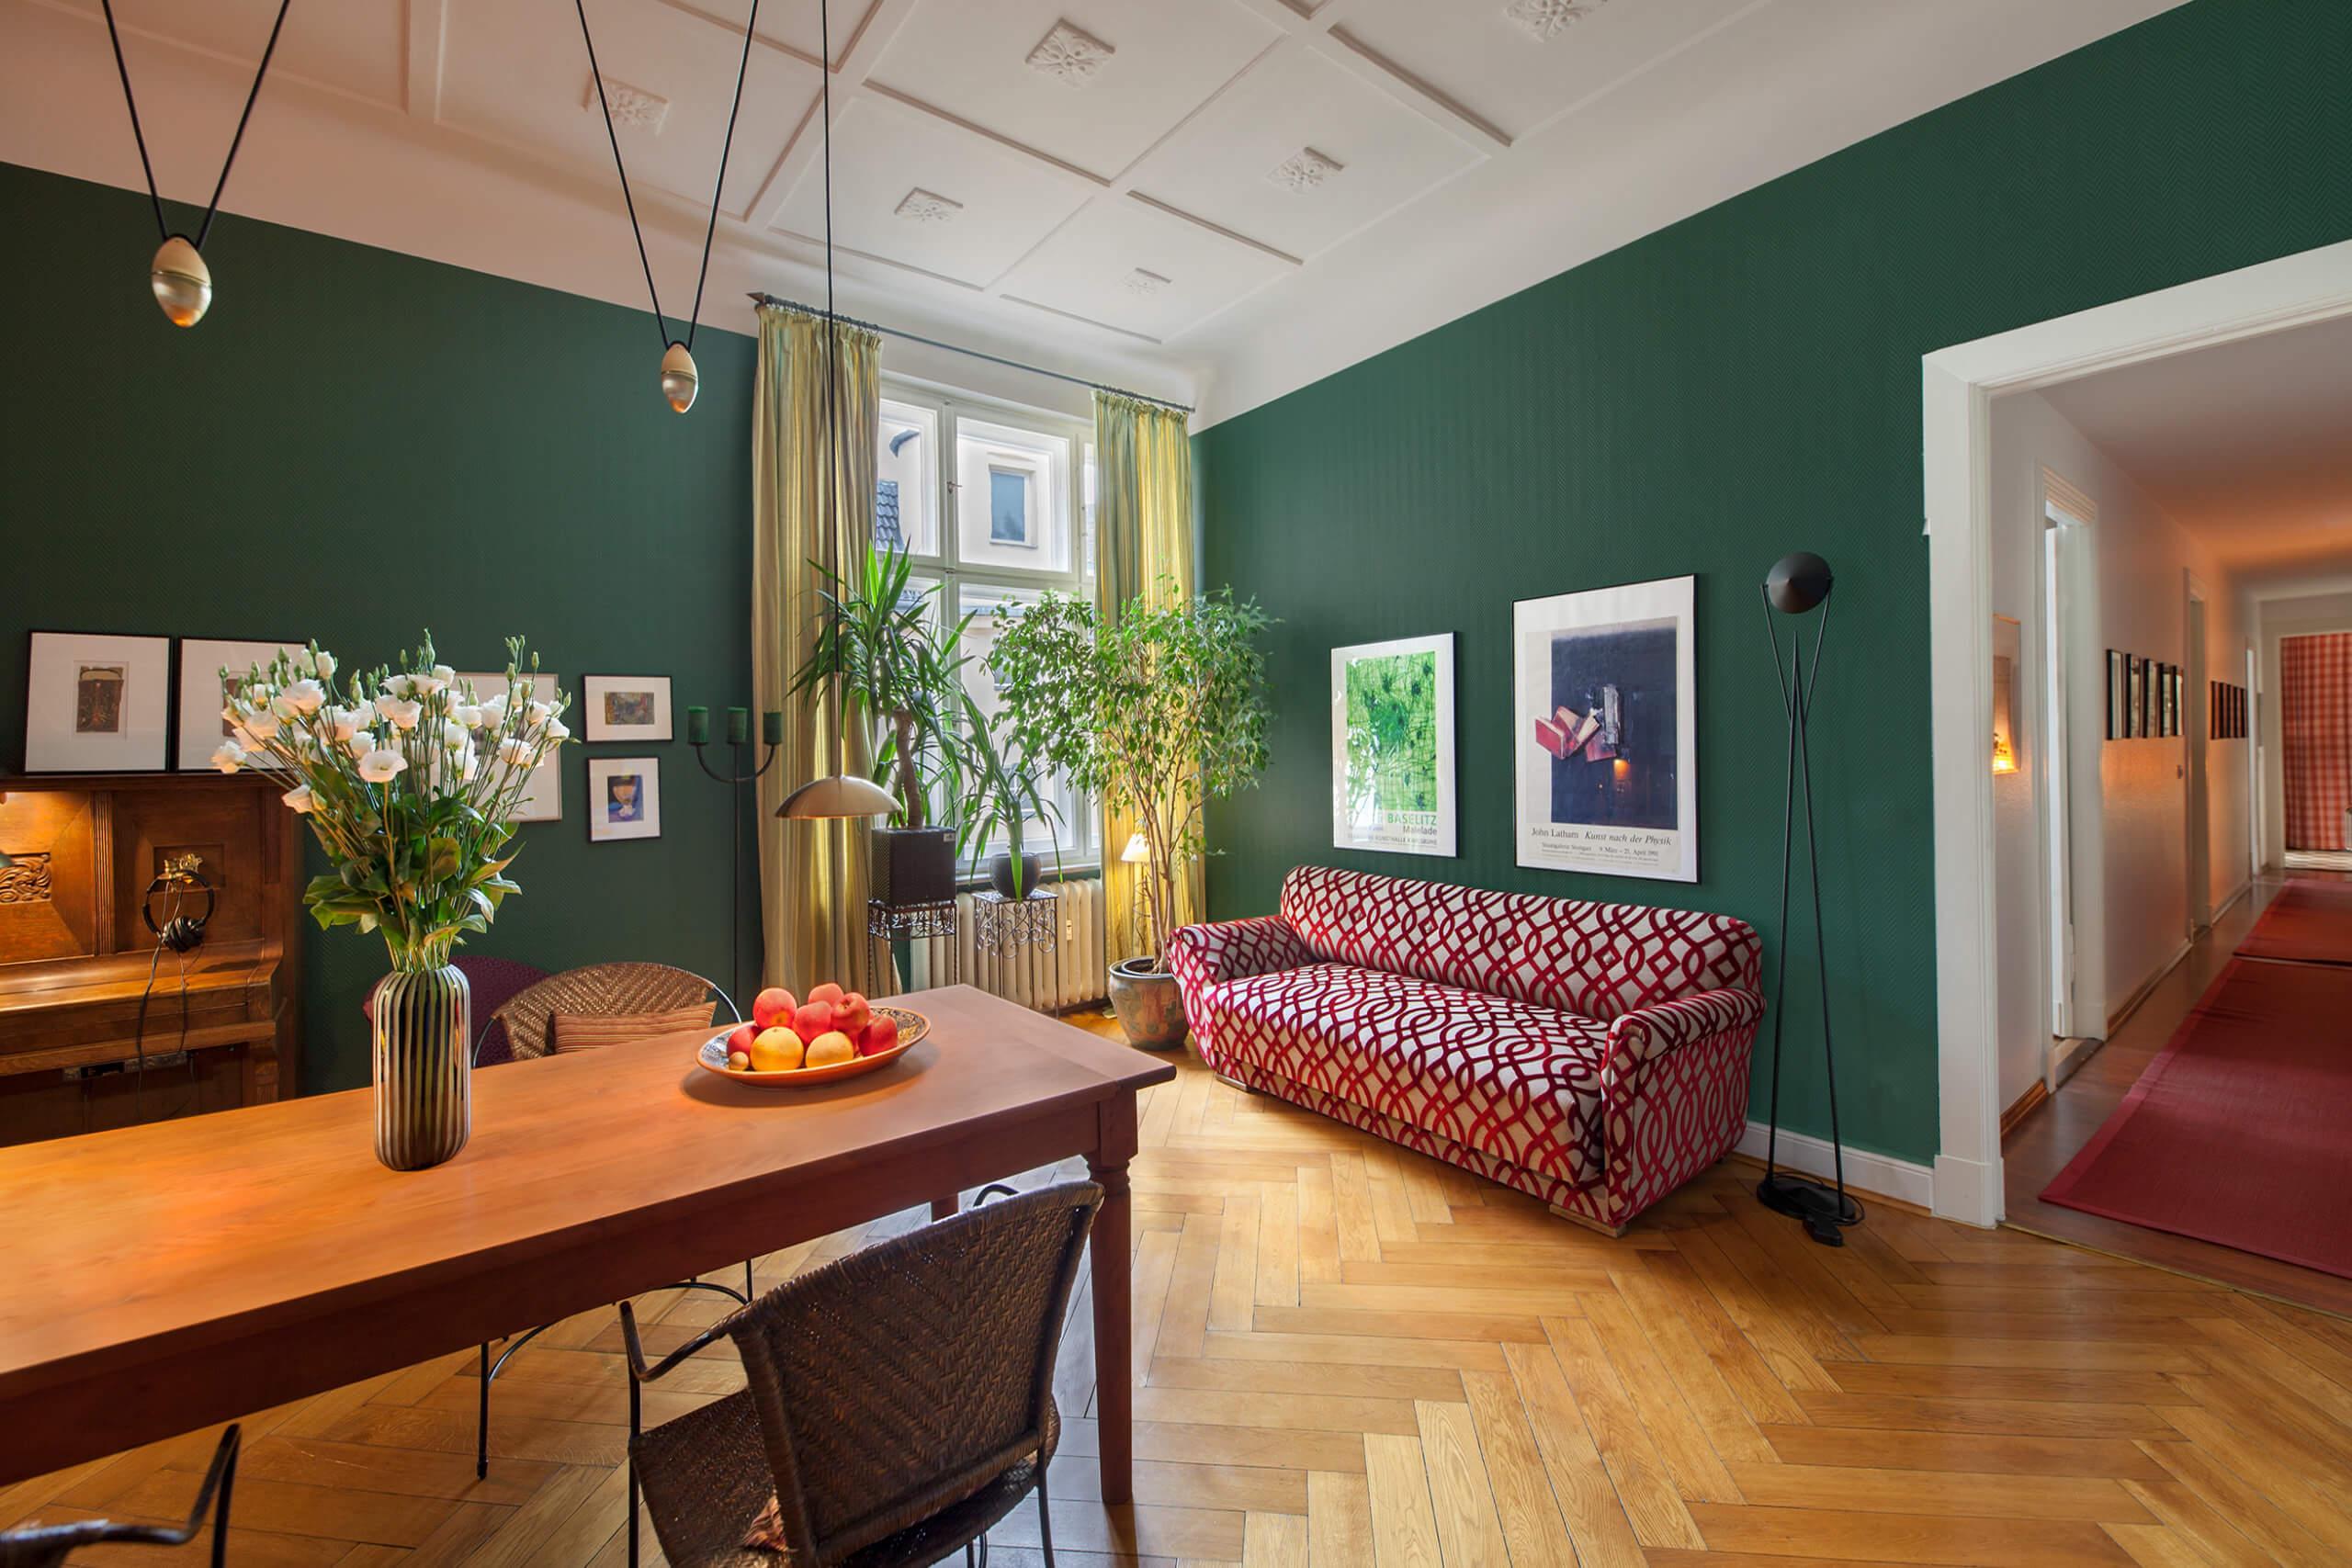 Polsterarbeiten in berlin wilmesrdorf adler wohndesign for Wohndesign berlin